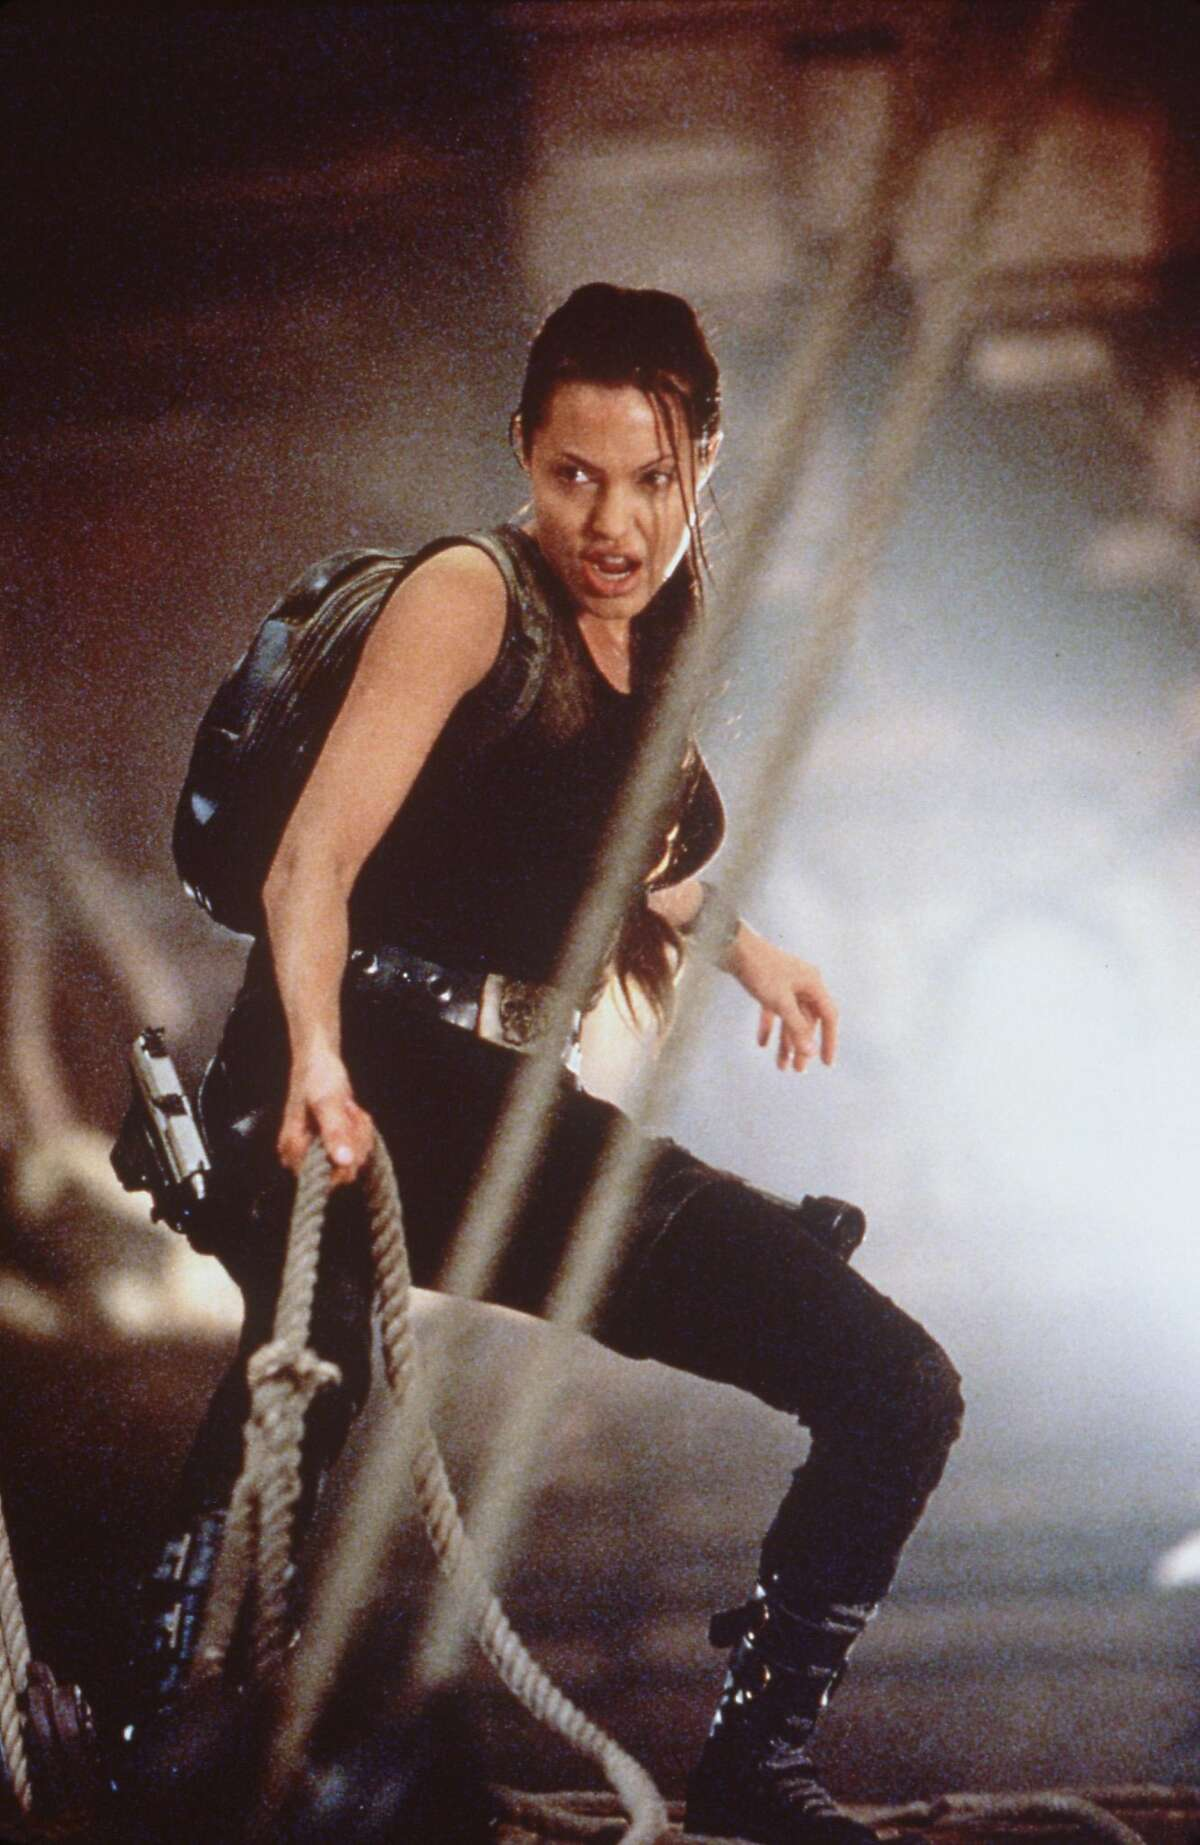 ``LARA CROFT: TOMB RAIDER'' - Angelina Jolie. HOUCHRON CAPTION (05/24/2001): Angelina Jolie stars in